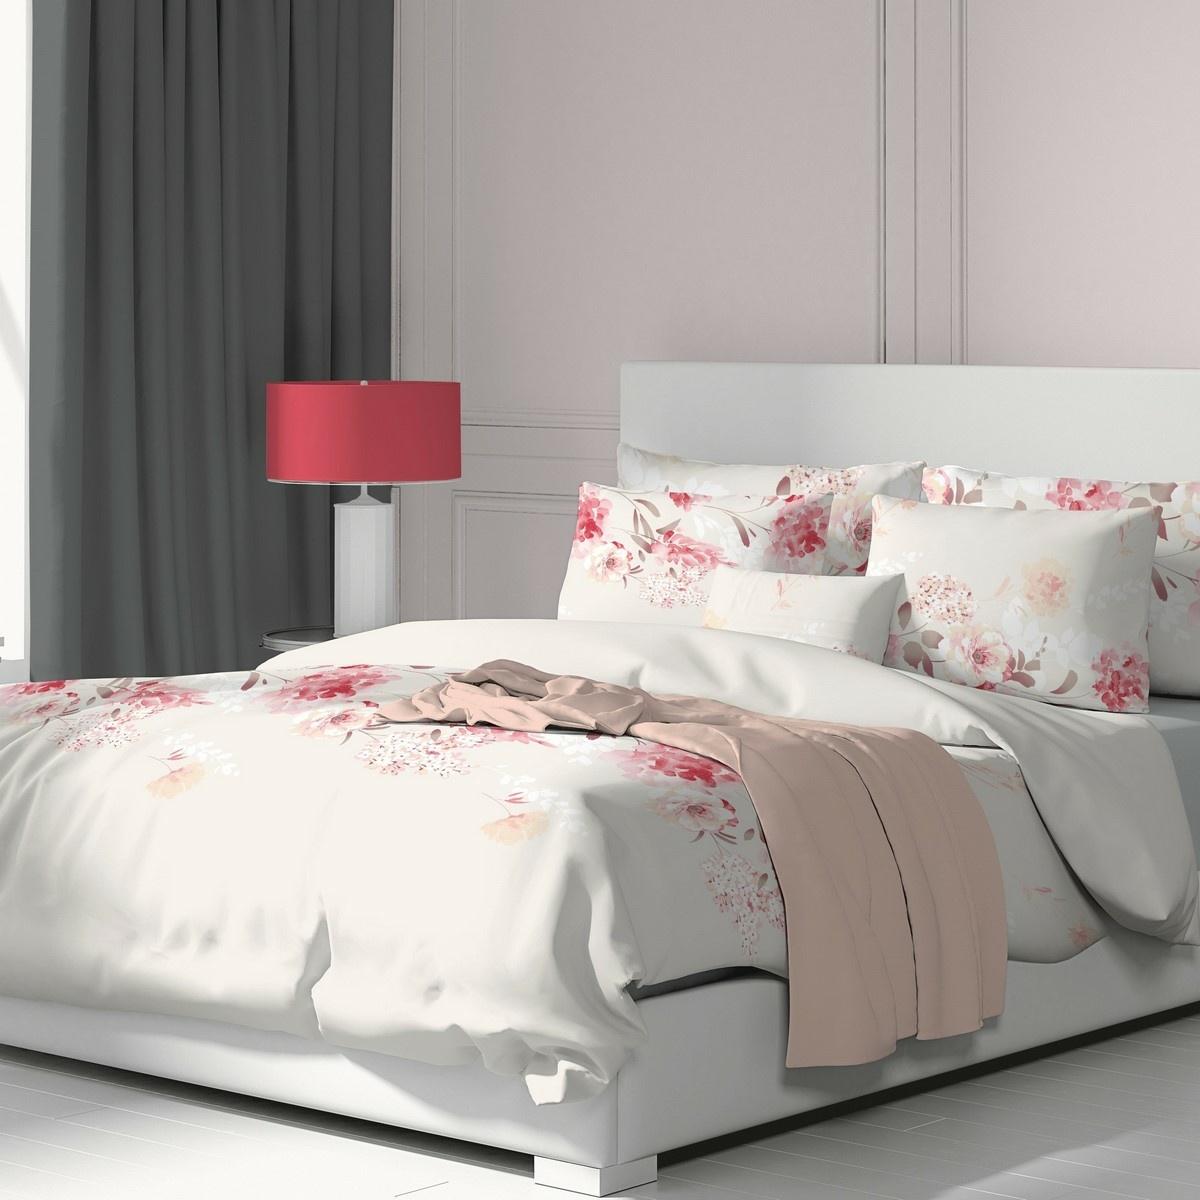 Kvalitex Tanea pamut ágynemű, rózsaszín, 140 x 200 cm, 70 x 90 cm, 140 x 200 cm, 70 x 90 cm